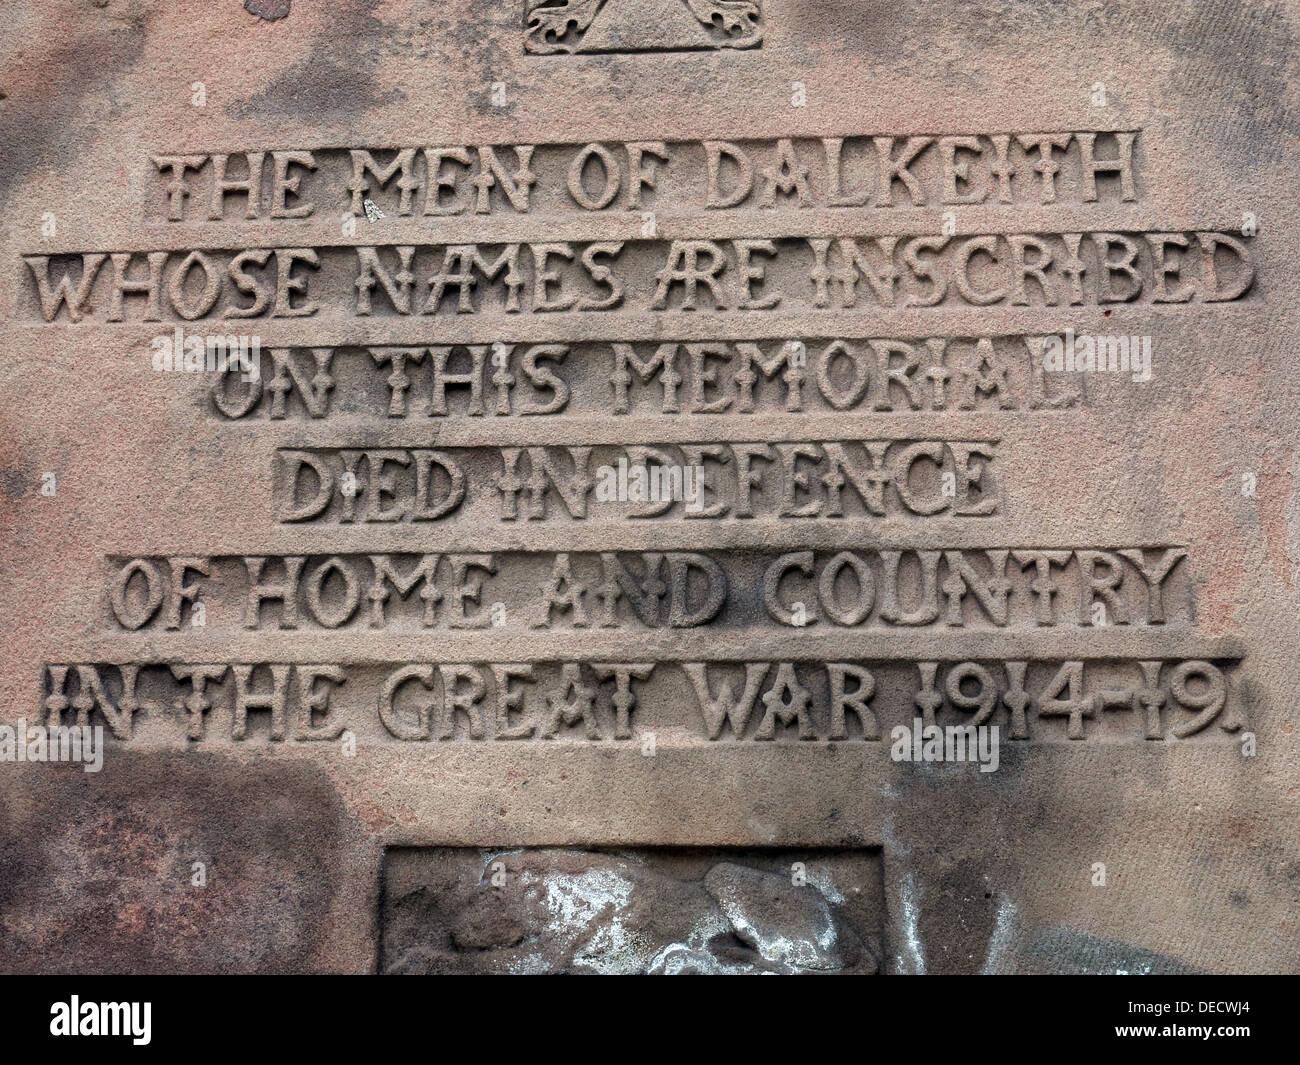 Inscriptions on Dalkeith War memorial 1914-19, Midlothian,Scotland,UK - Stock Image